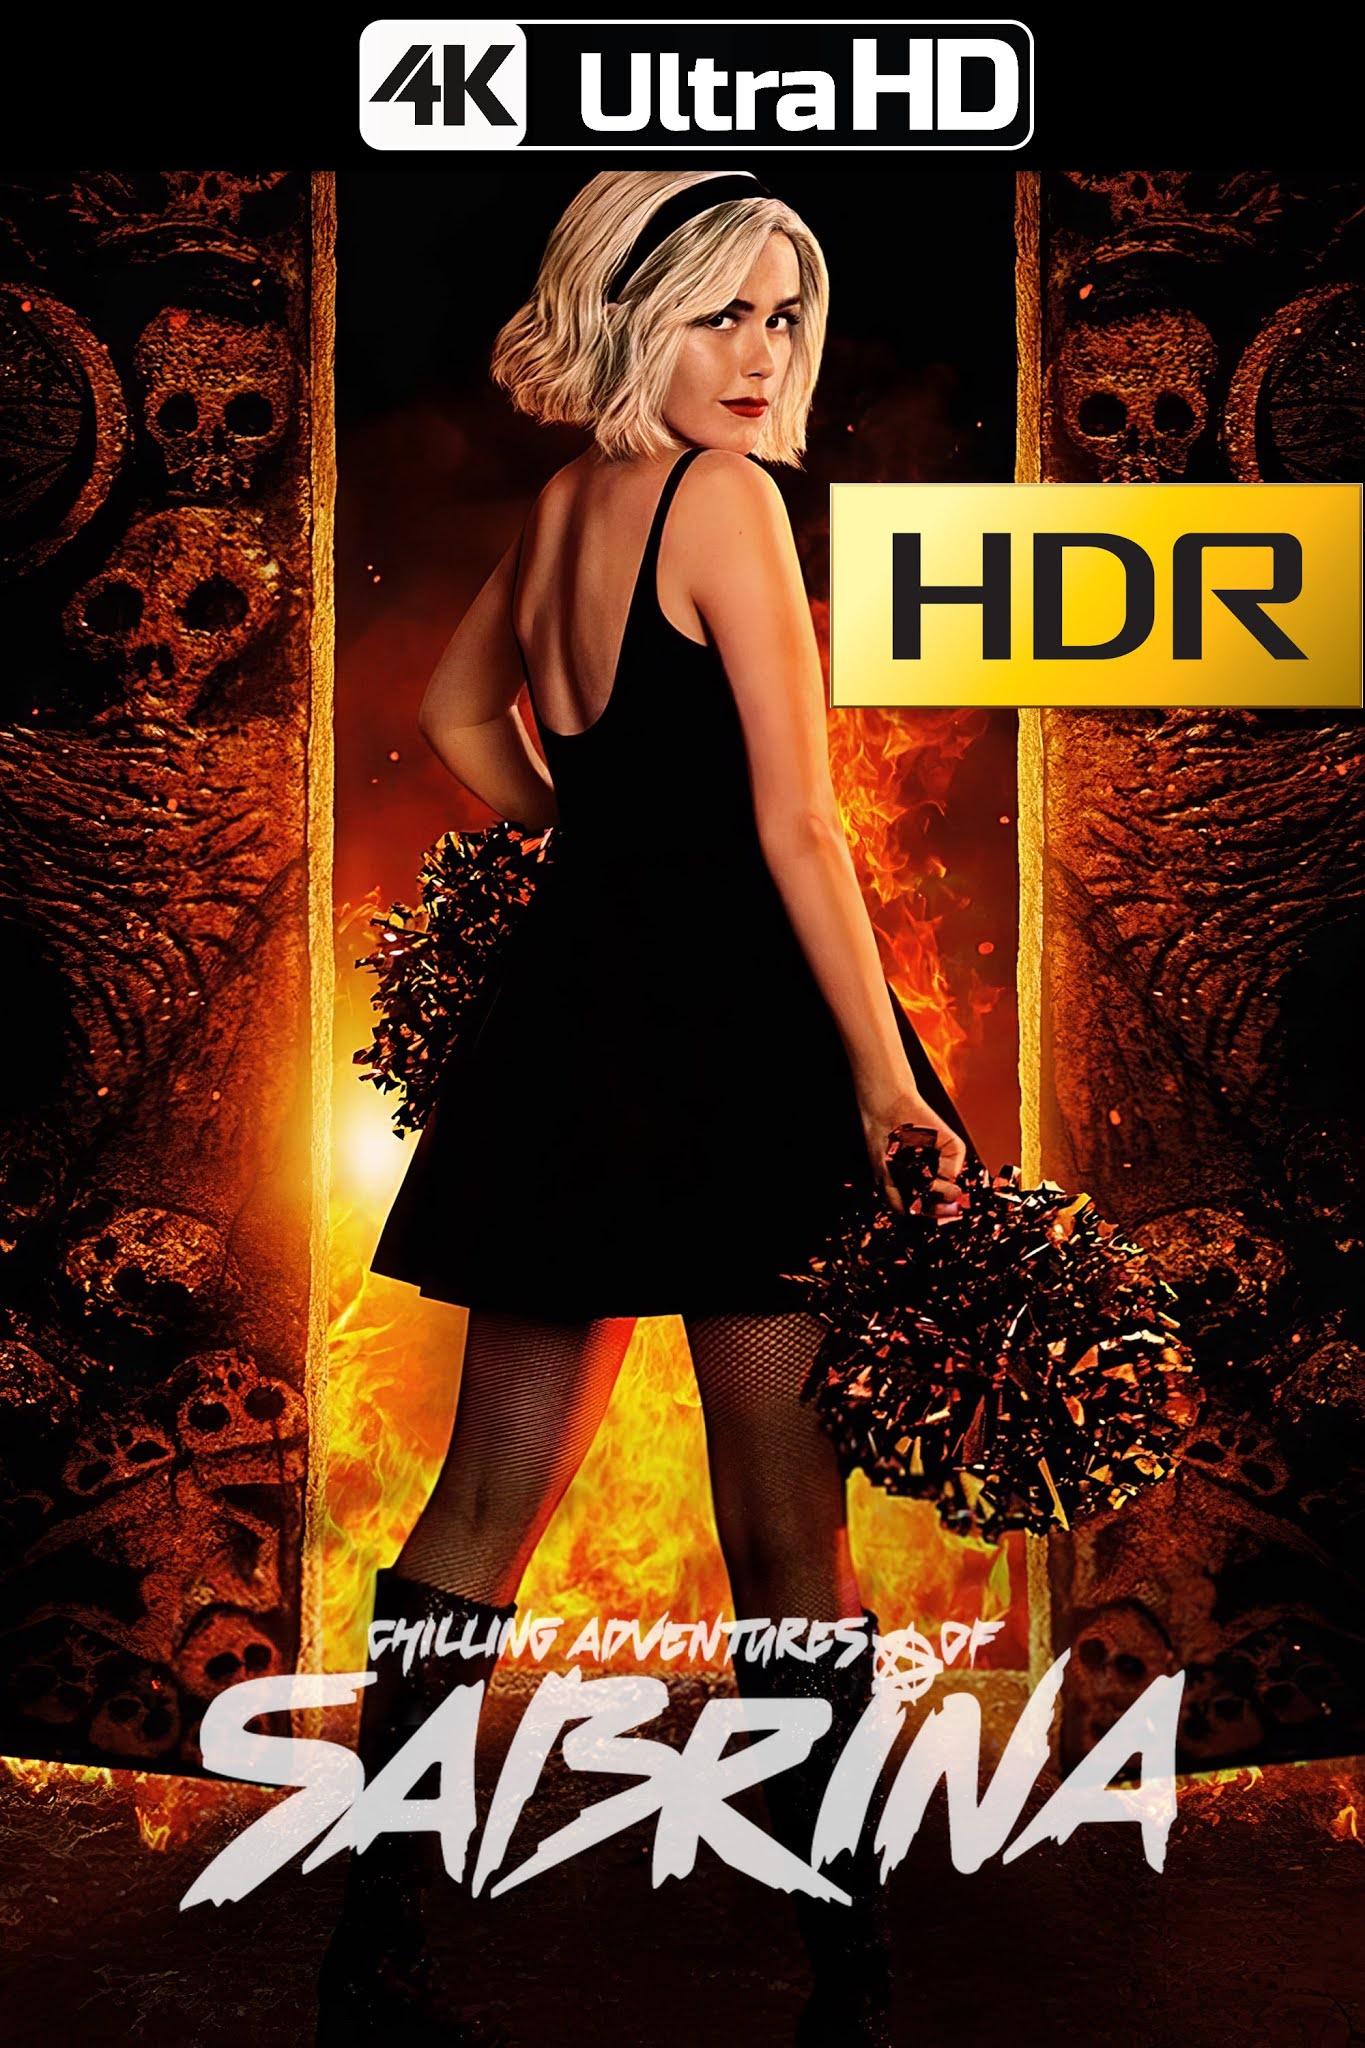 Chilling Adventures of Sabrina (2020) Temporada 02/Parte 03 NF WEBRip 4K UHD HDR Latino